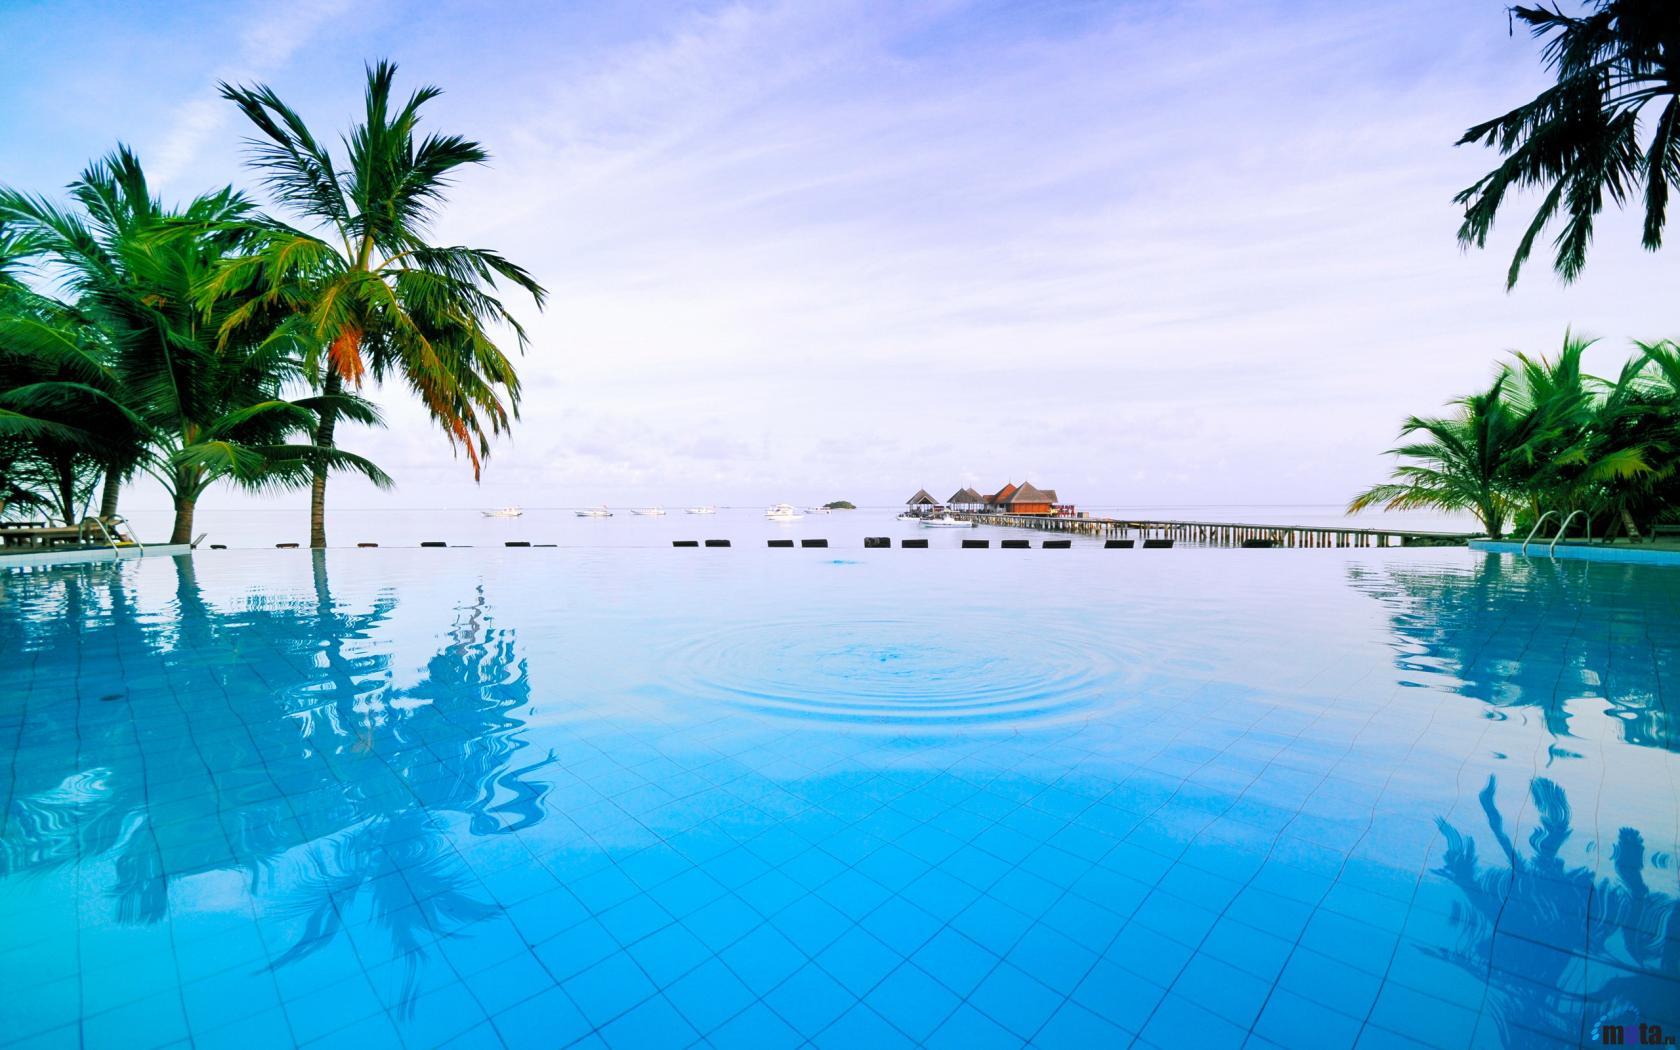 Download Wallpaper Swimming pool in Maldives hotel 1680 x 1050 1680x1050